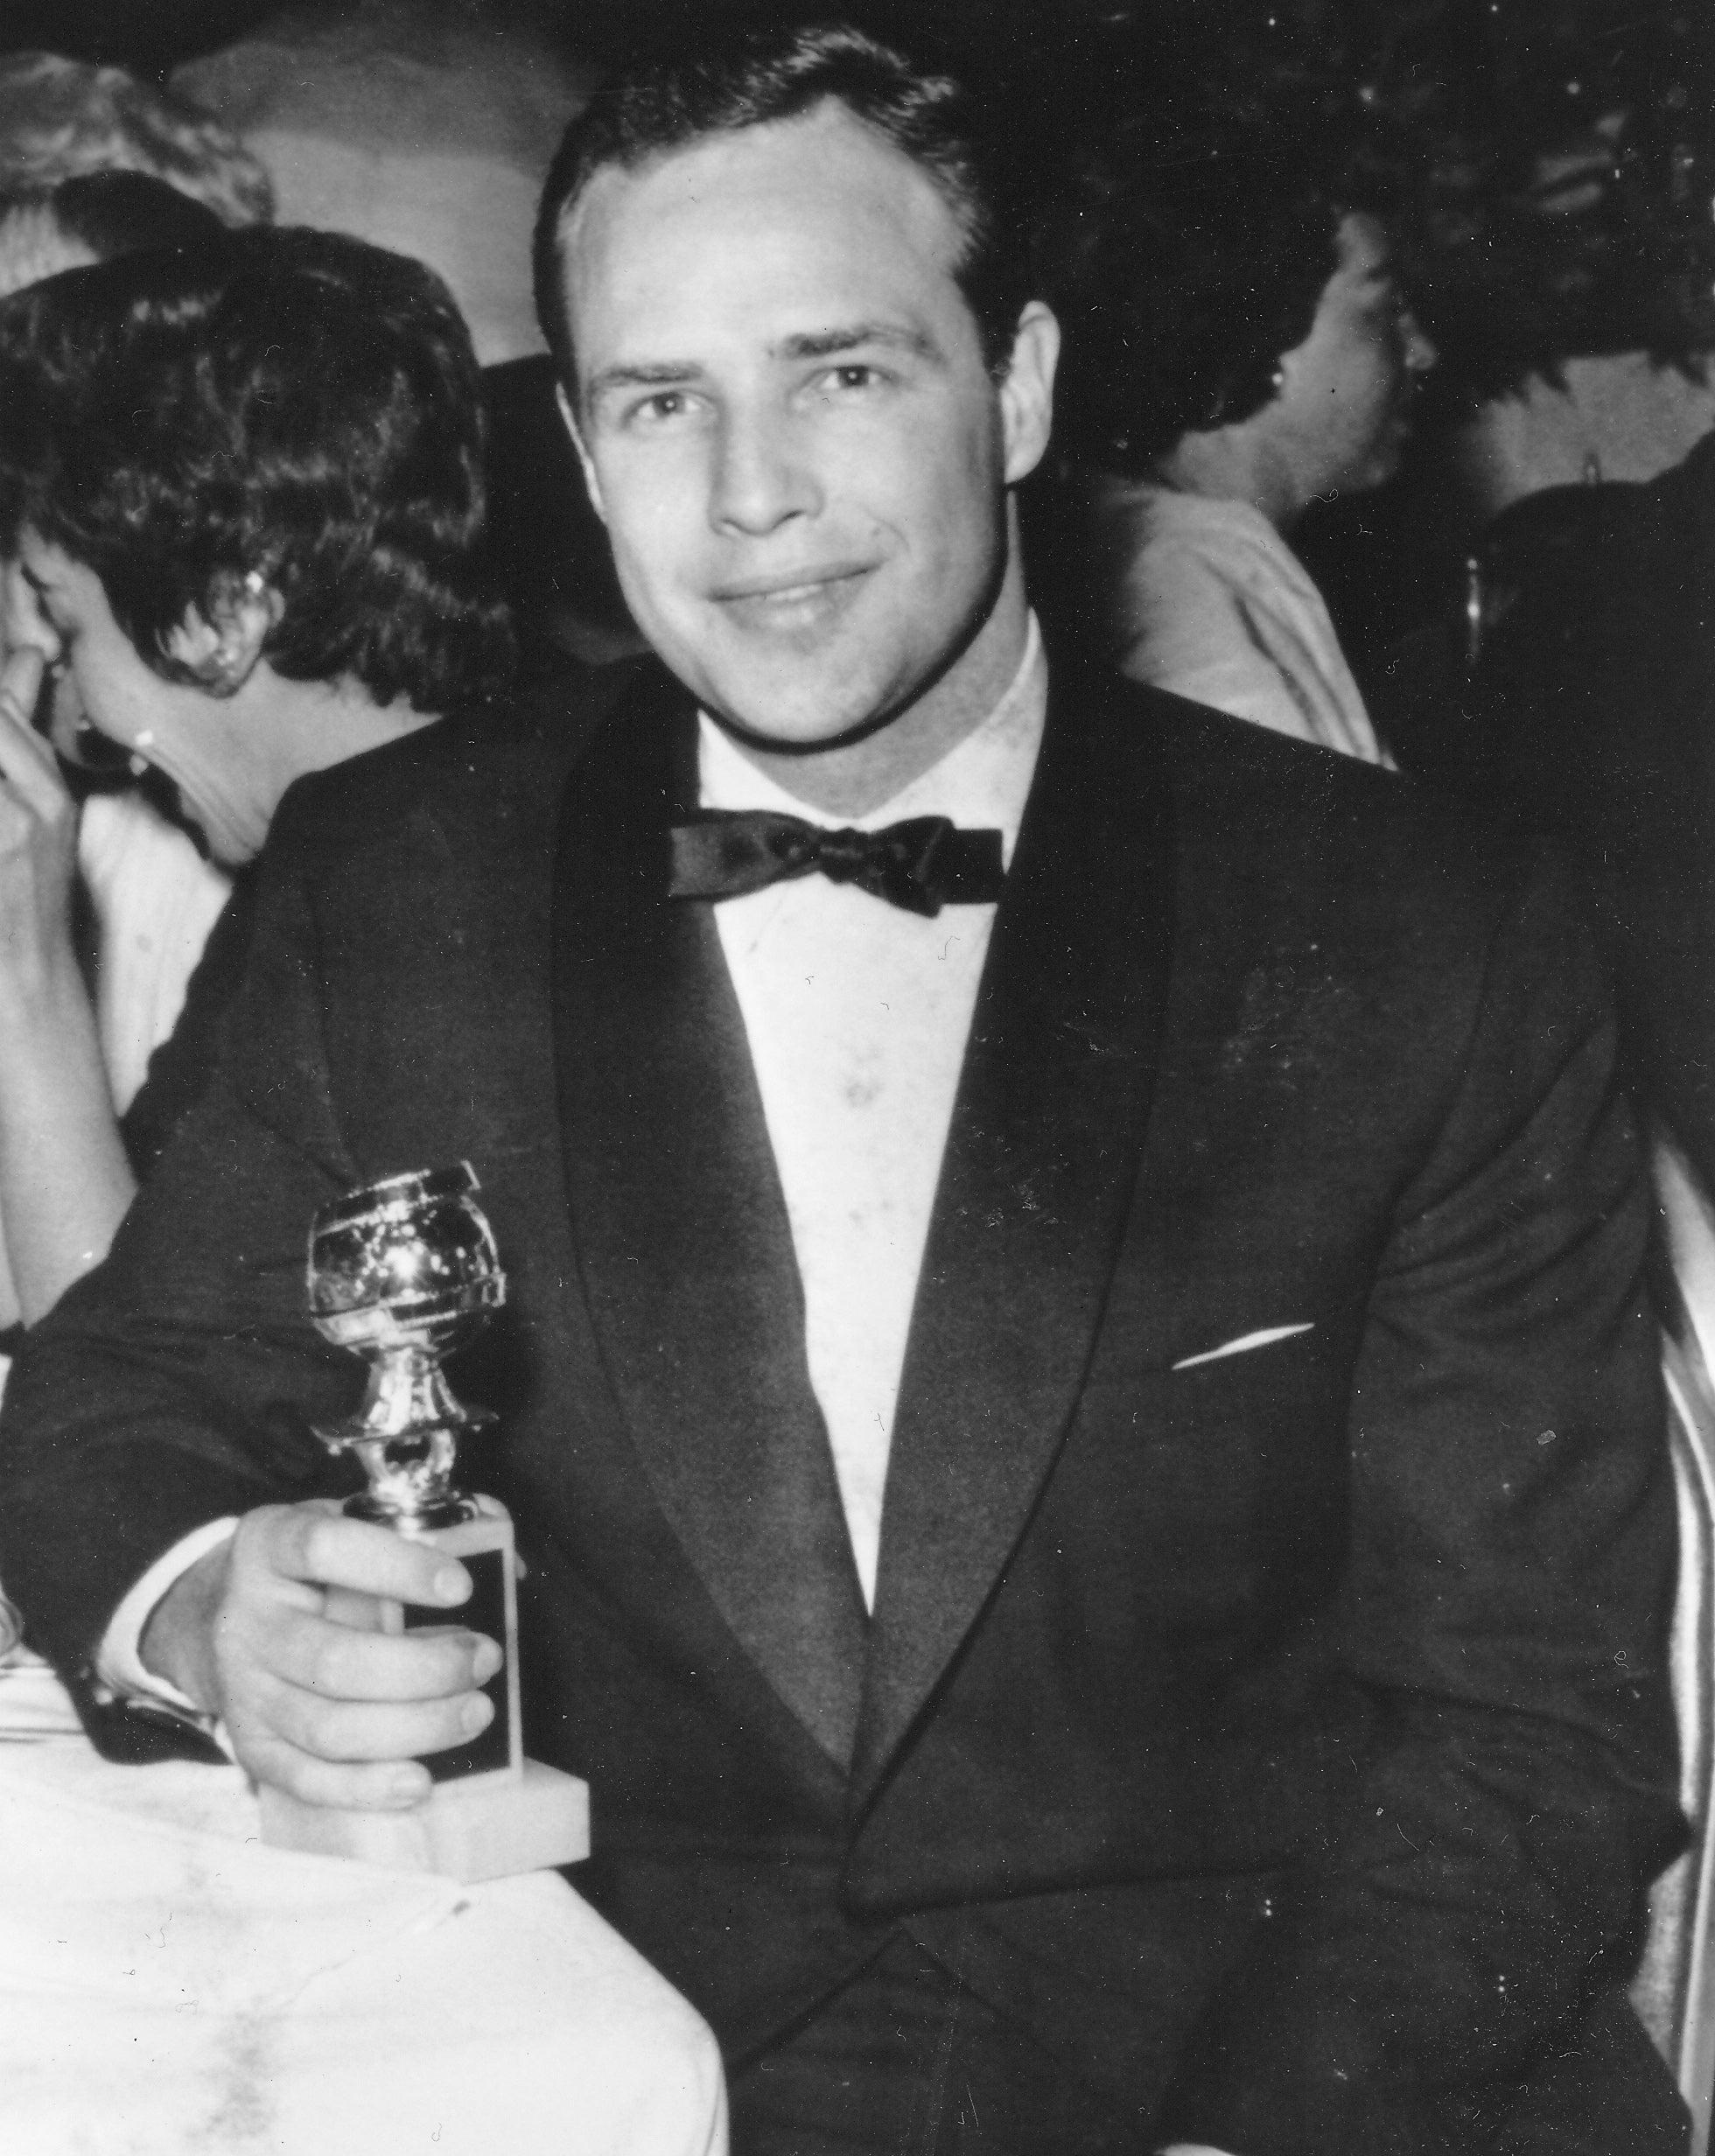 Marlon Brando , Golden Globe Winner, Best Actor, 1956